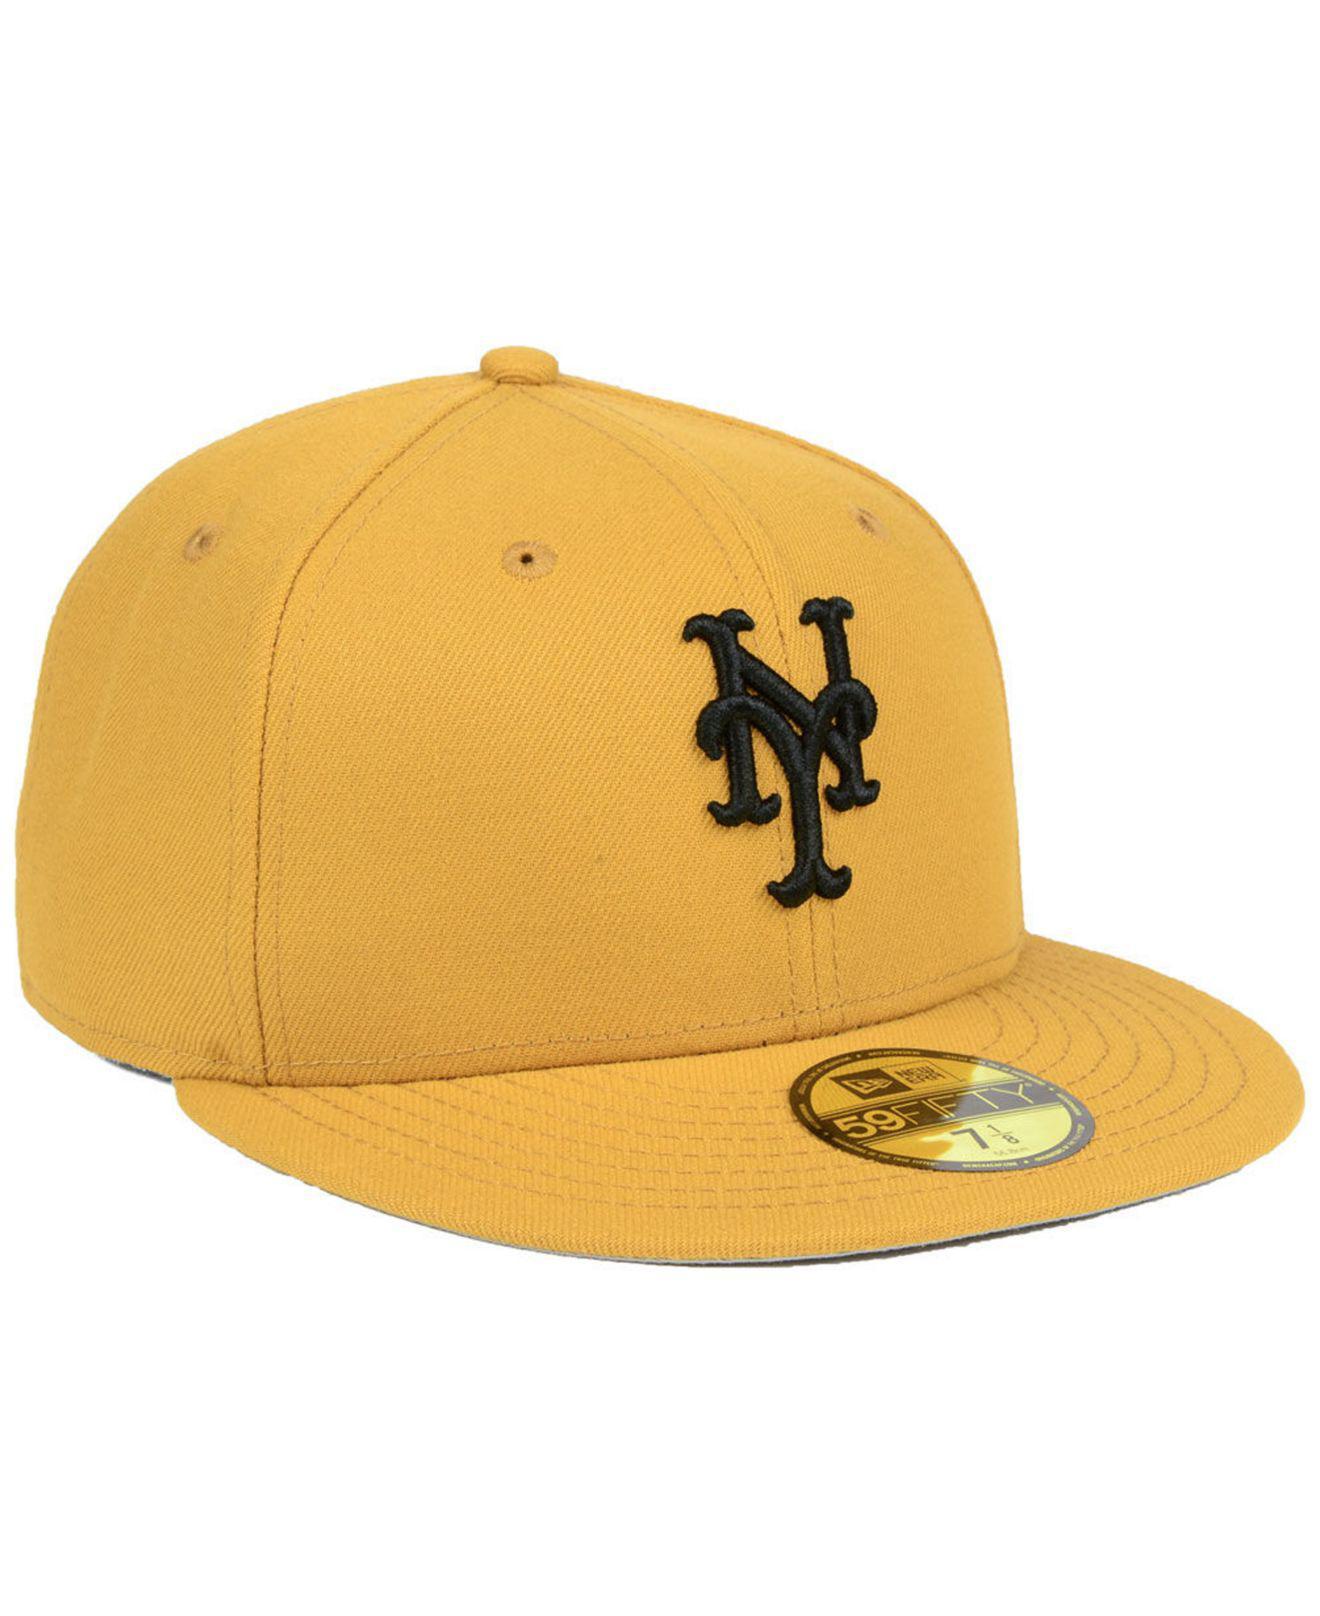 2f36e5deb29133 34.99 3854b b9da9; top quality new york mets reverse c dub 59fifty fitted  cap for men . view fullscreen